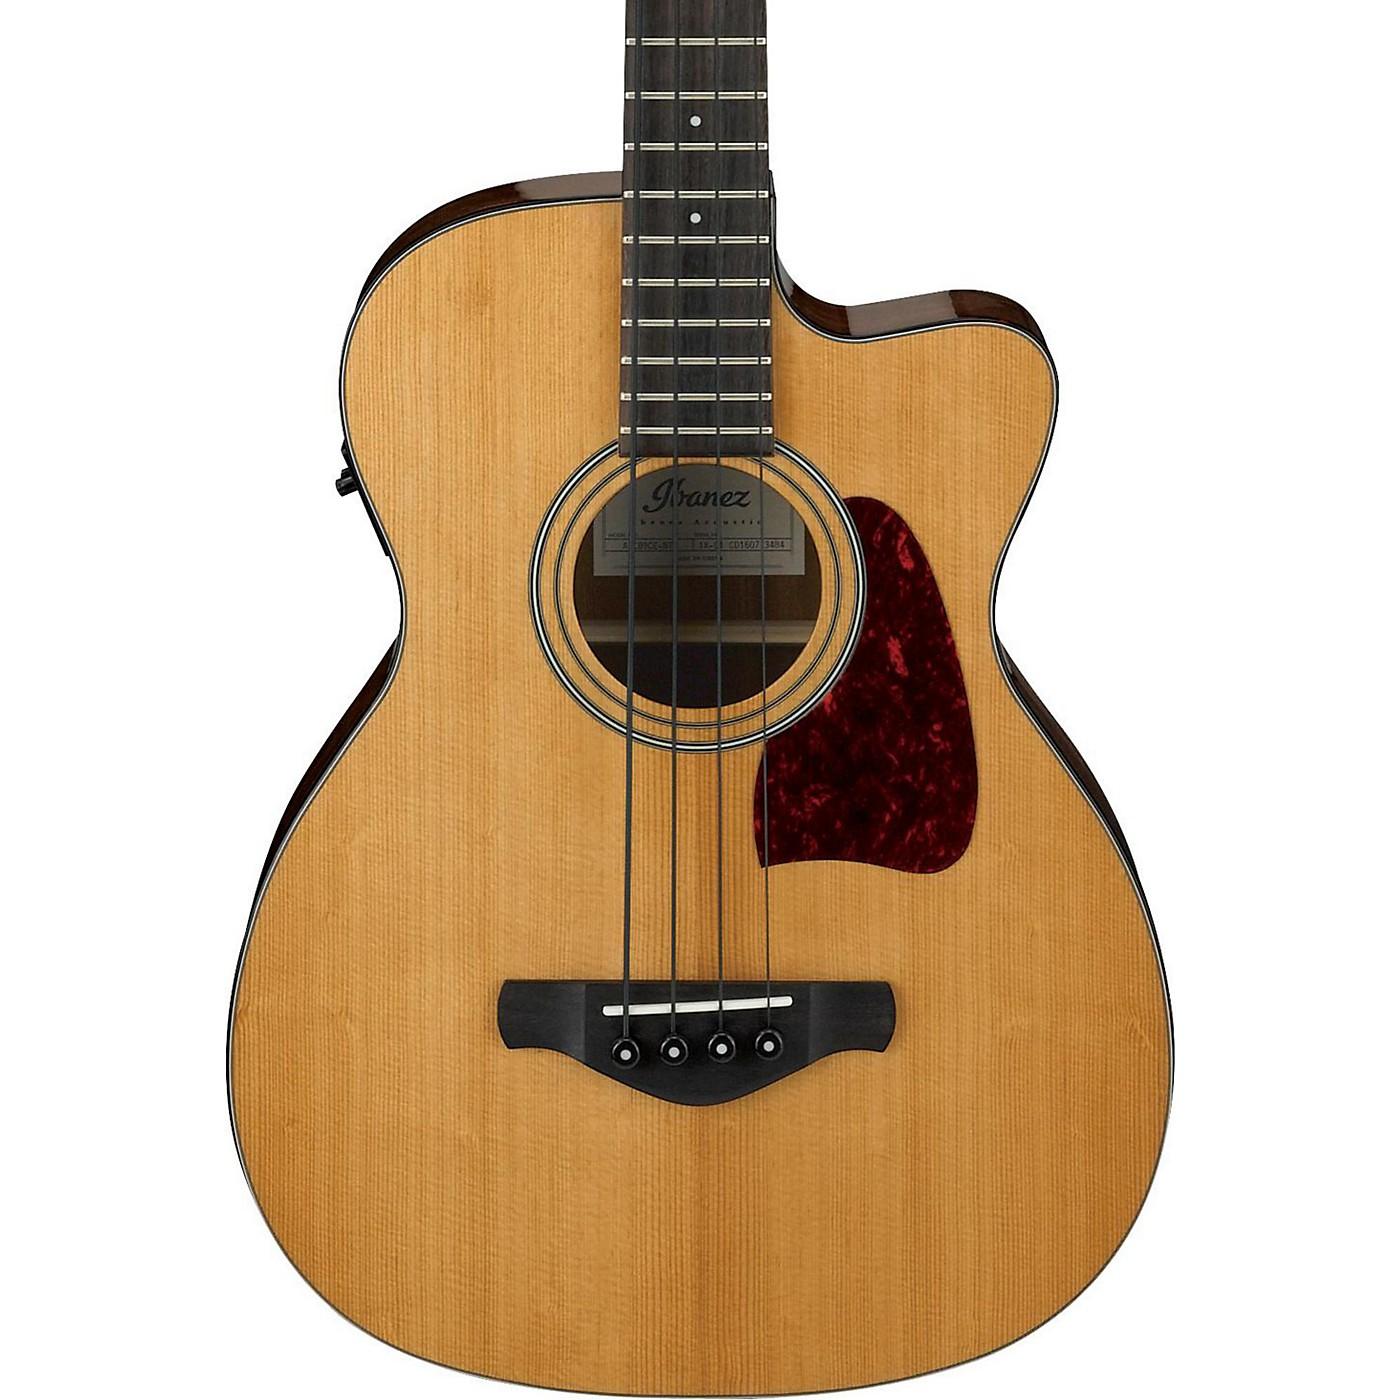 Ibanez Artwood Vintage AVCB9CENT Electric-Acoustic Bass Guitar thumbnail